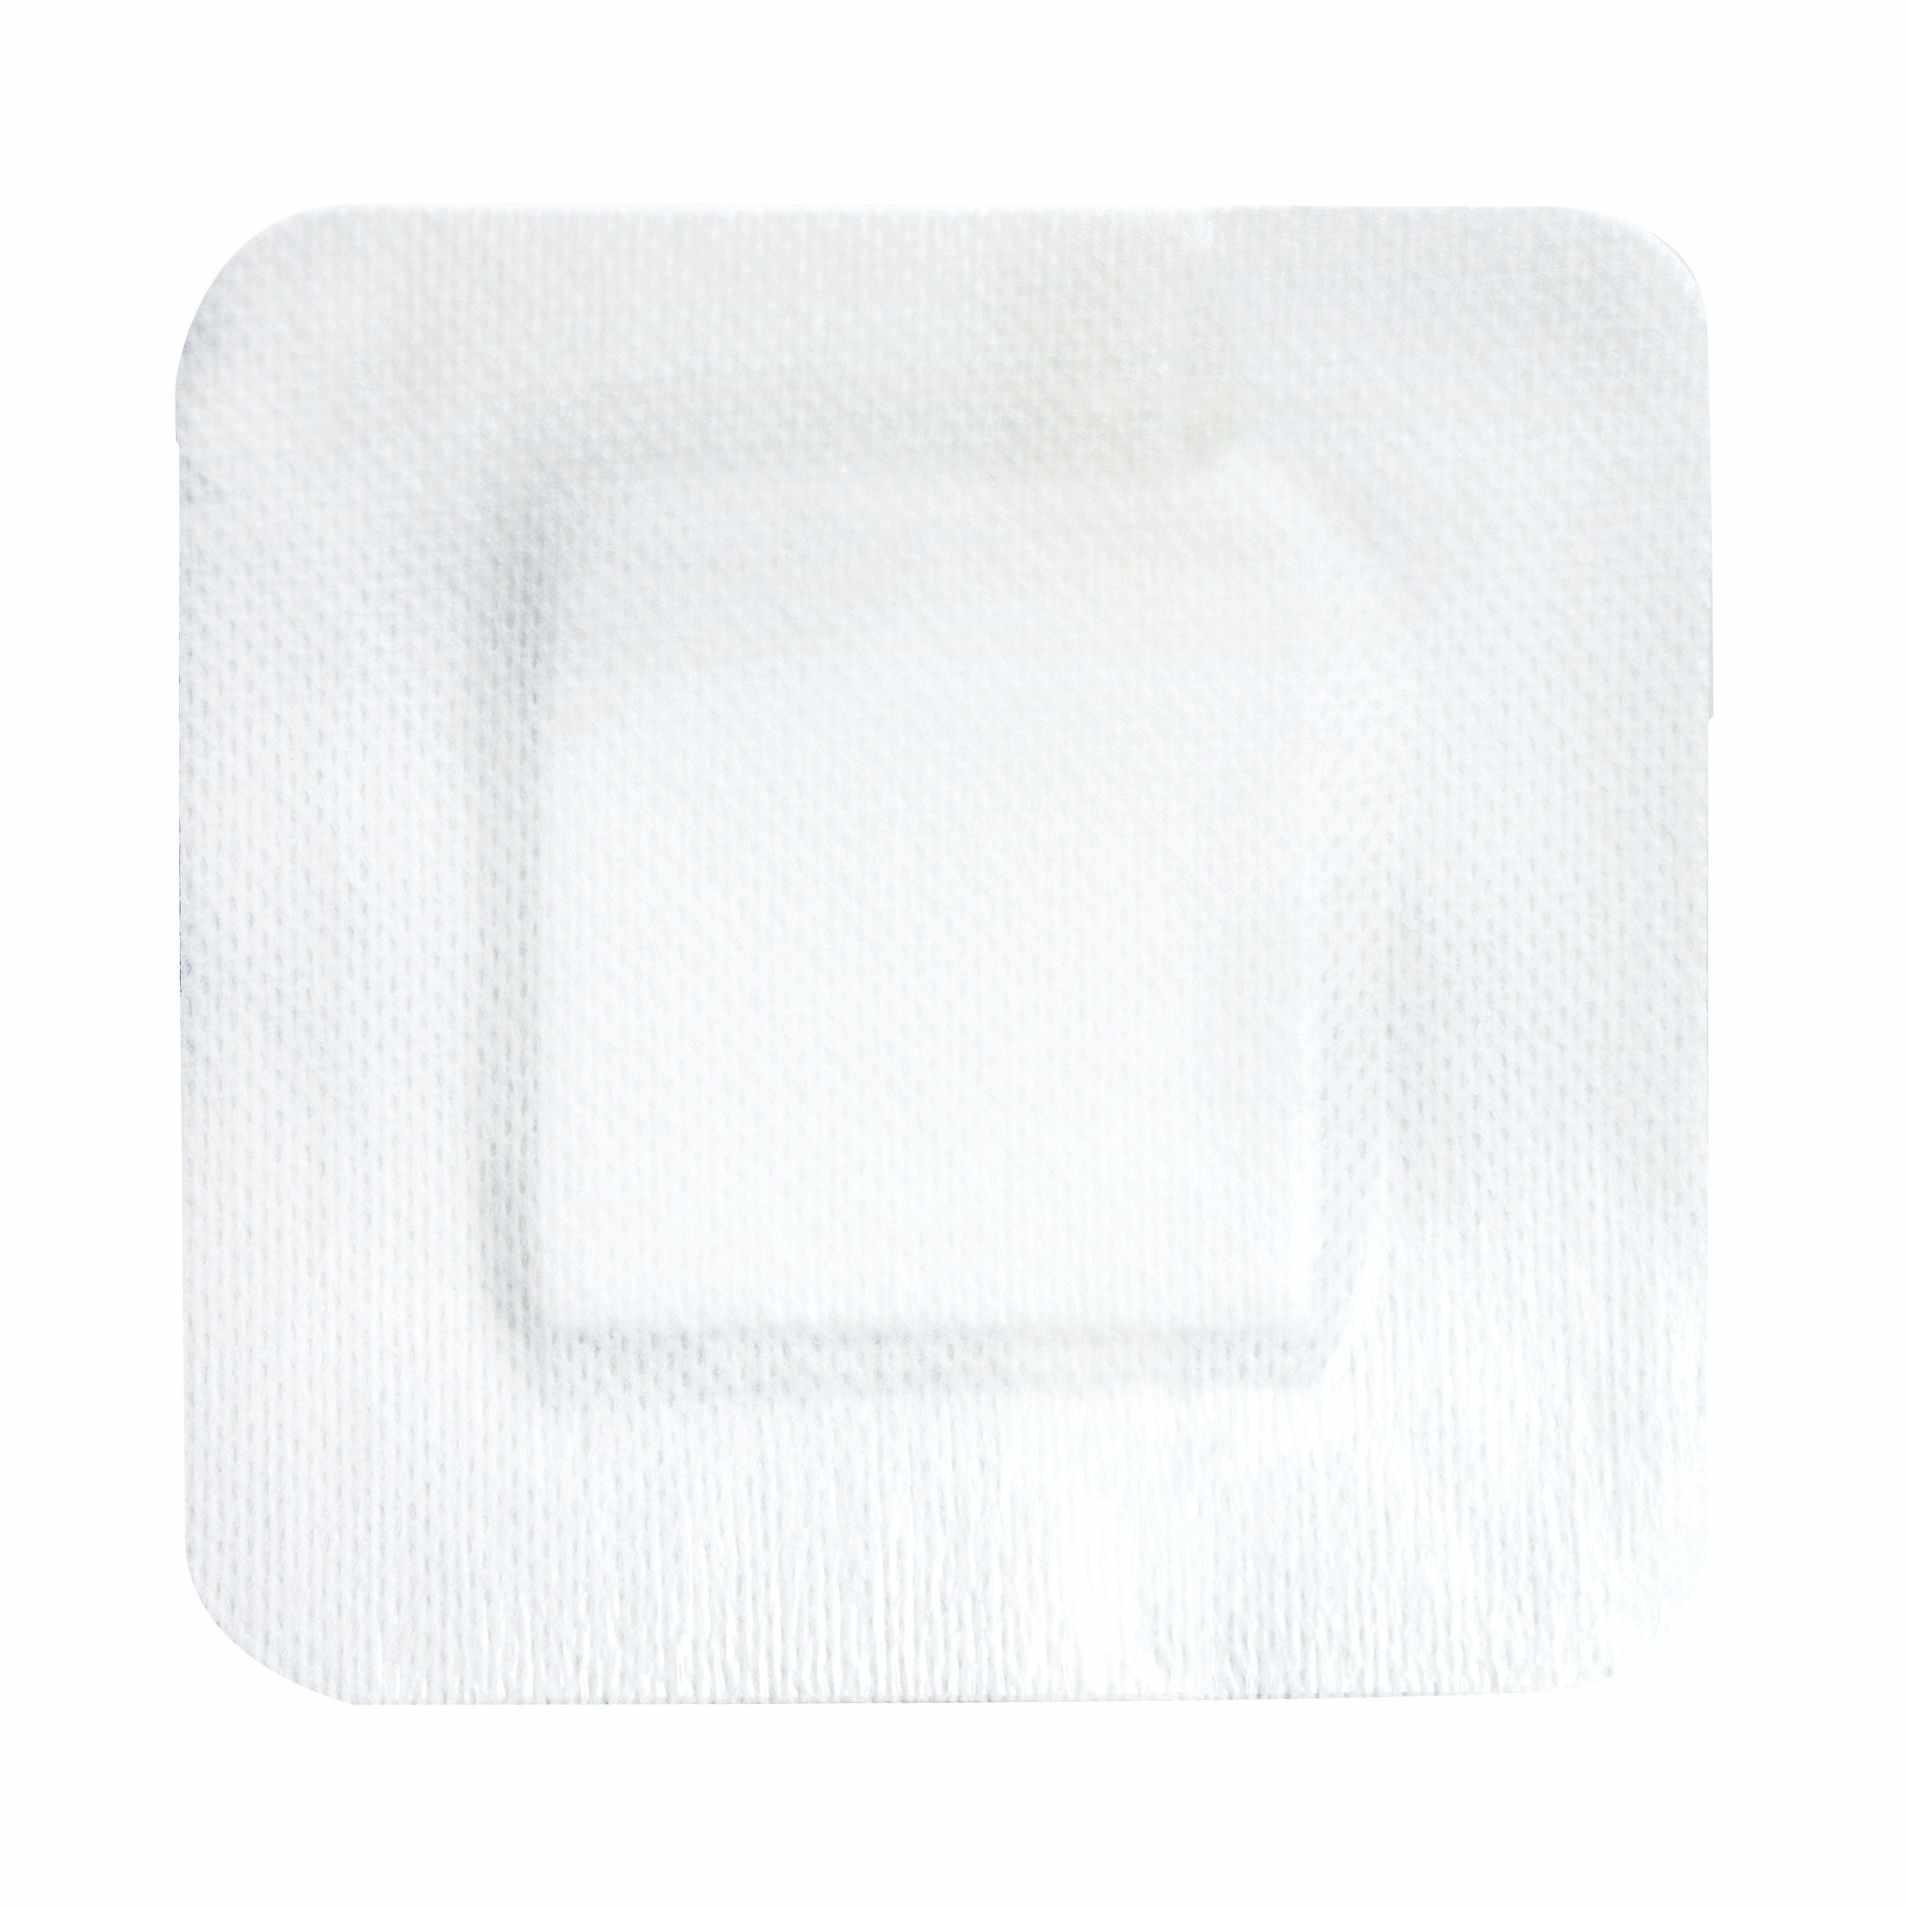 "Derma sciences dudress film top barrier dressing 6"" x 8"""